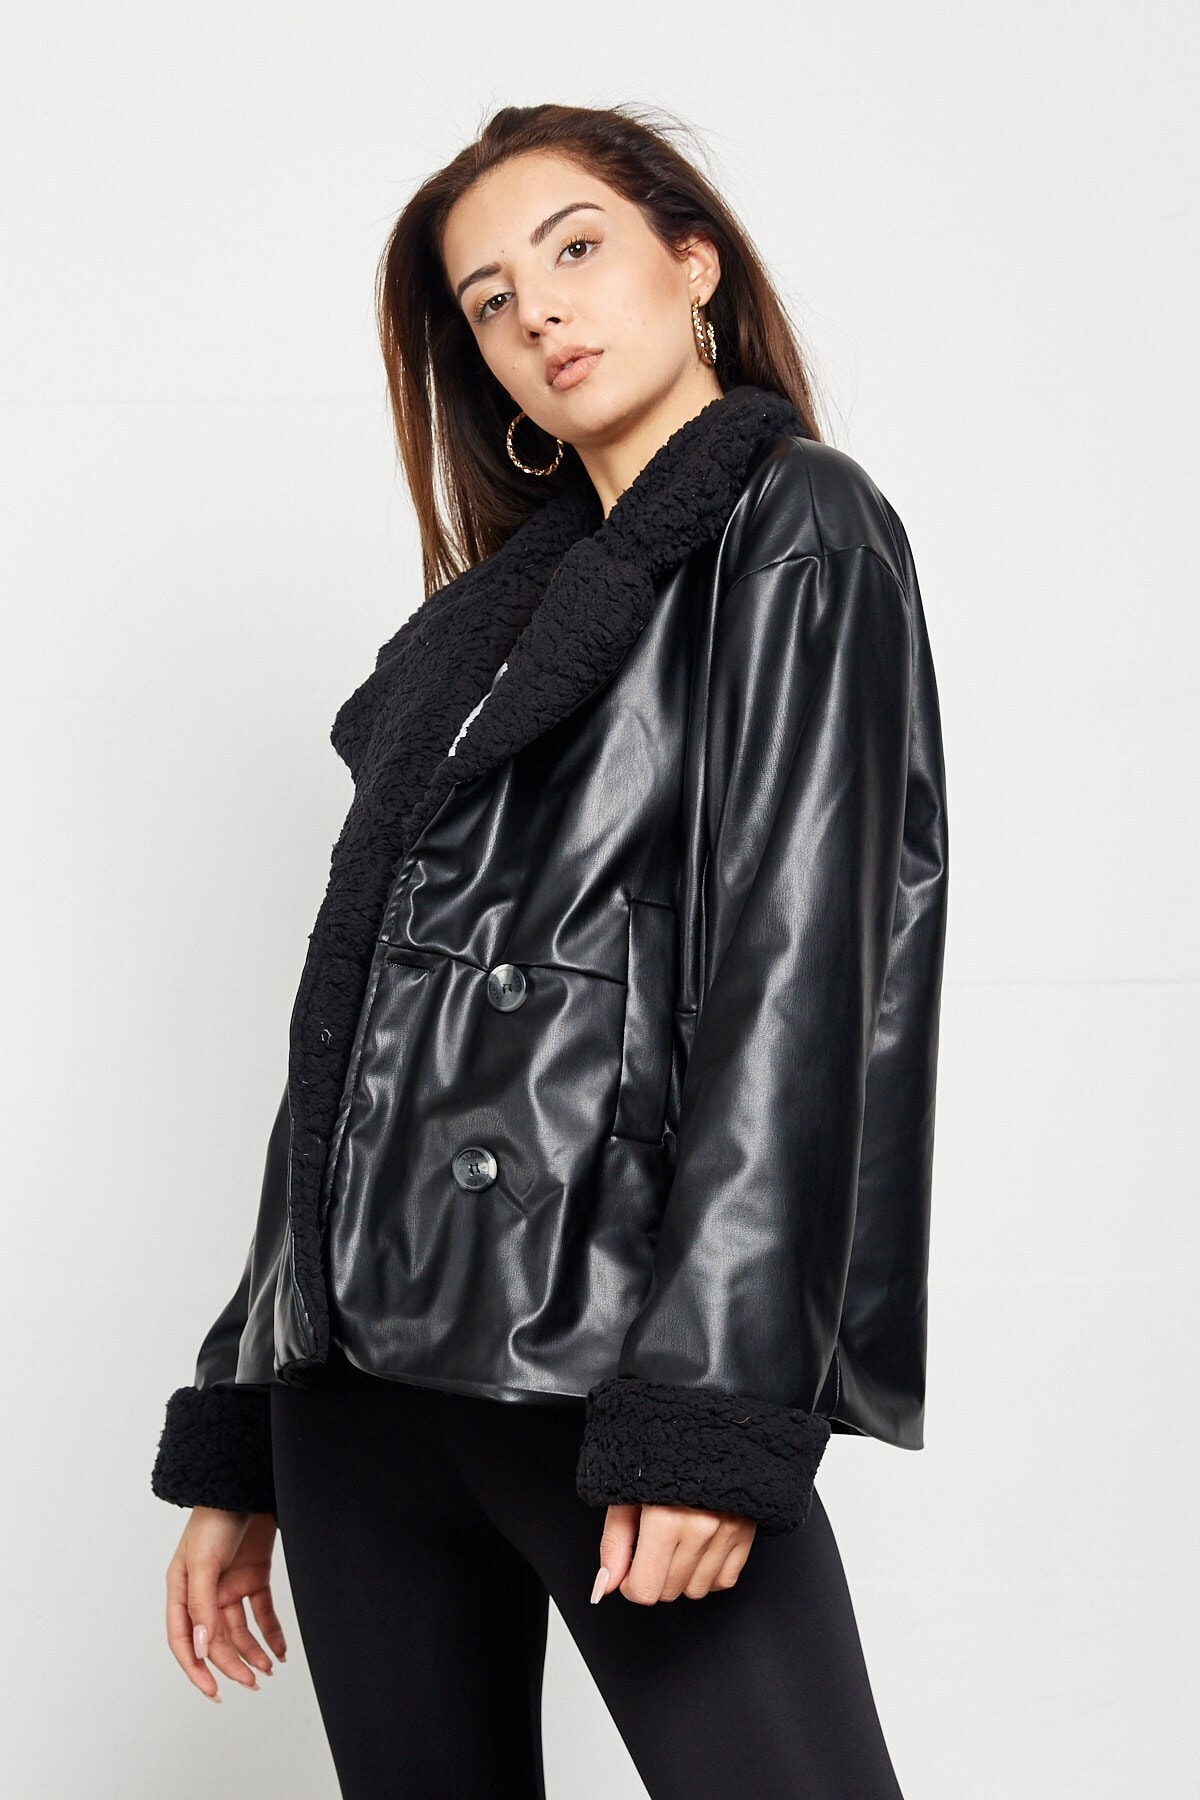 new high quality women fashion autumn winter black faux leather jackets zipper  Women's Faux Wool Faux Leather Jacket Warm Coats enlarge